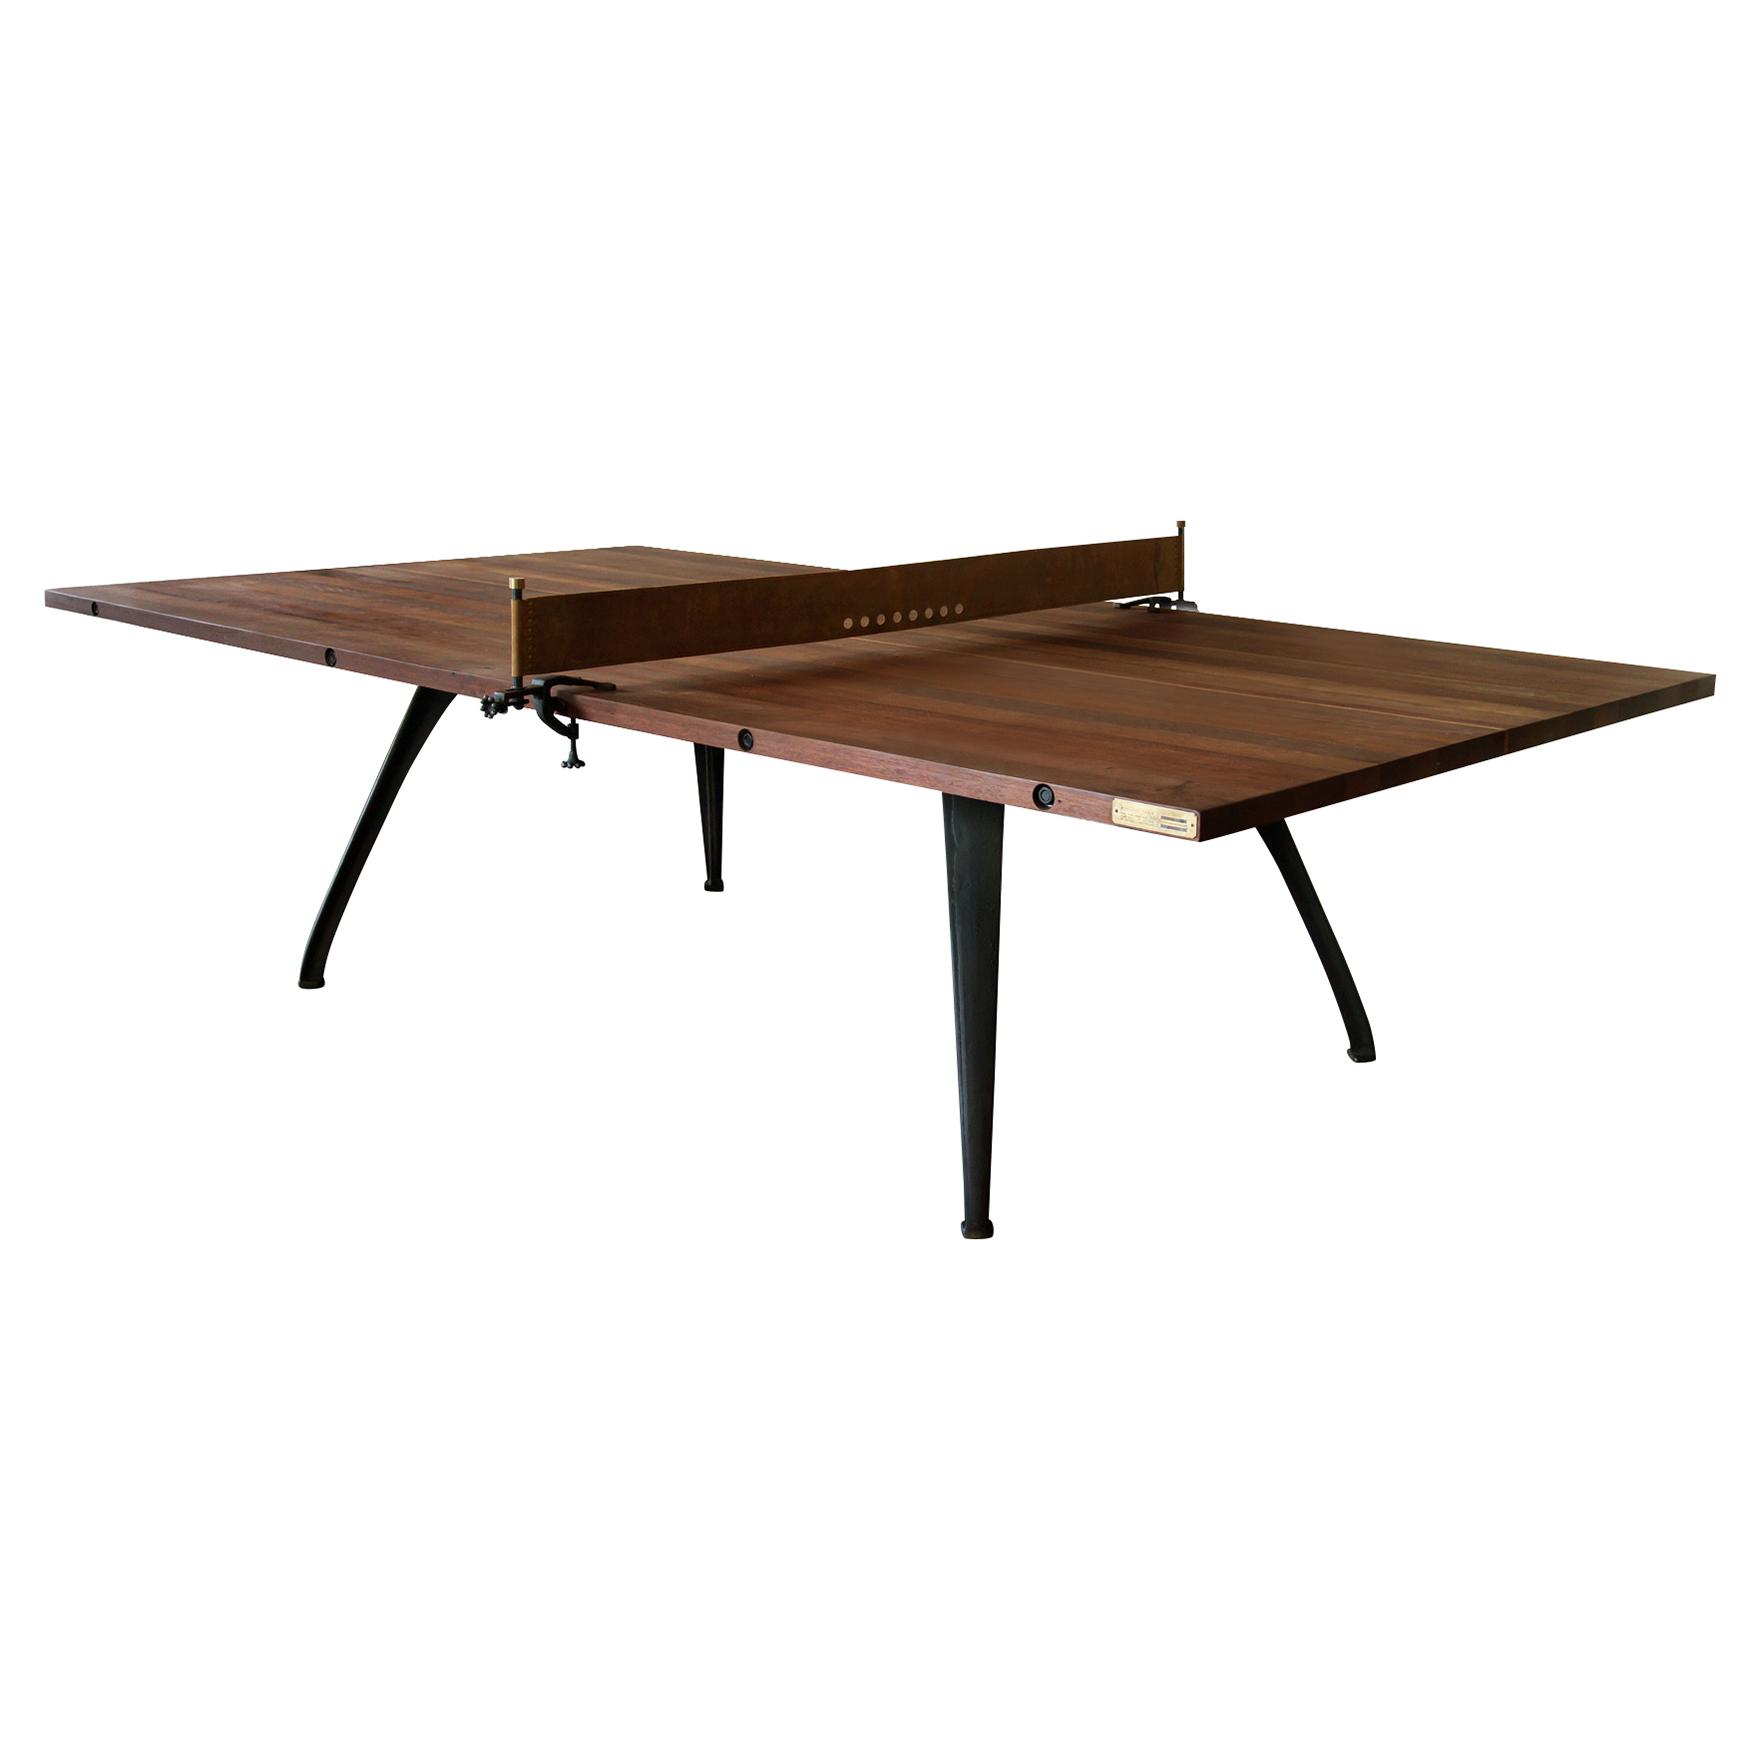 Palazzo Industrial Loft Wood Metal Ping Pong Table